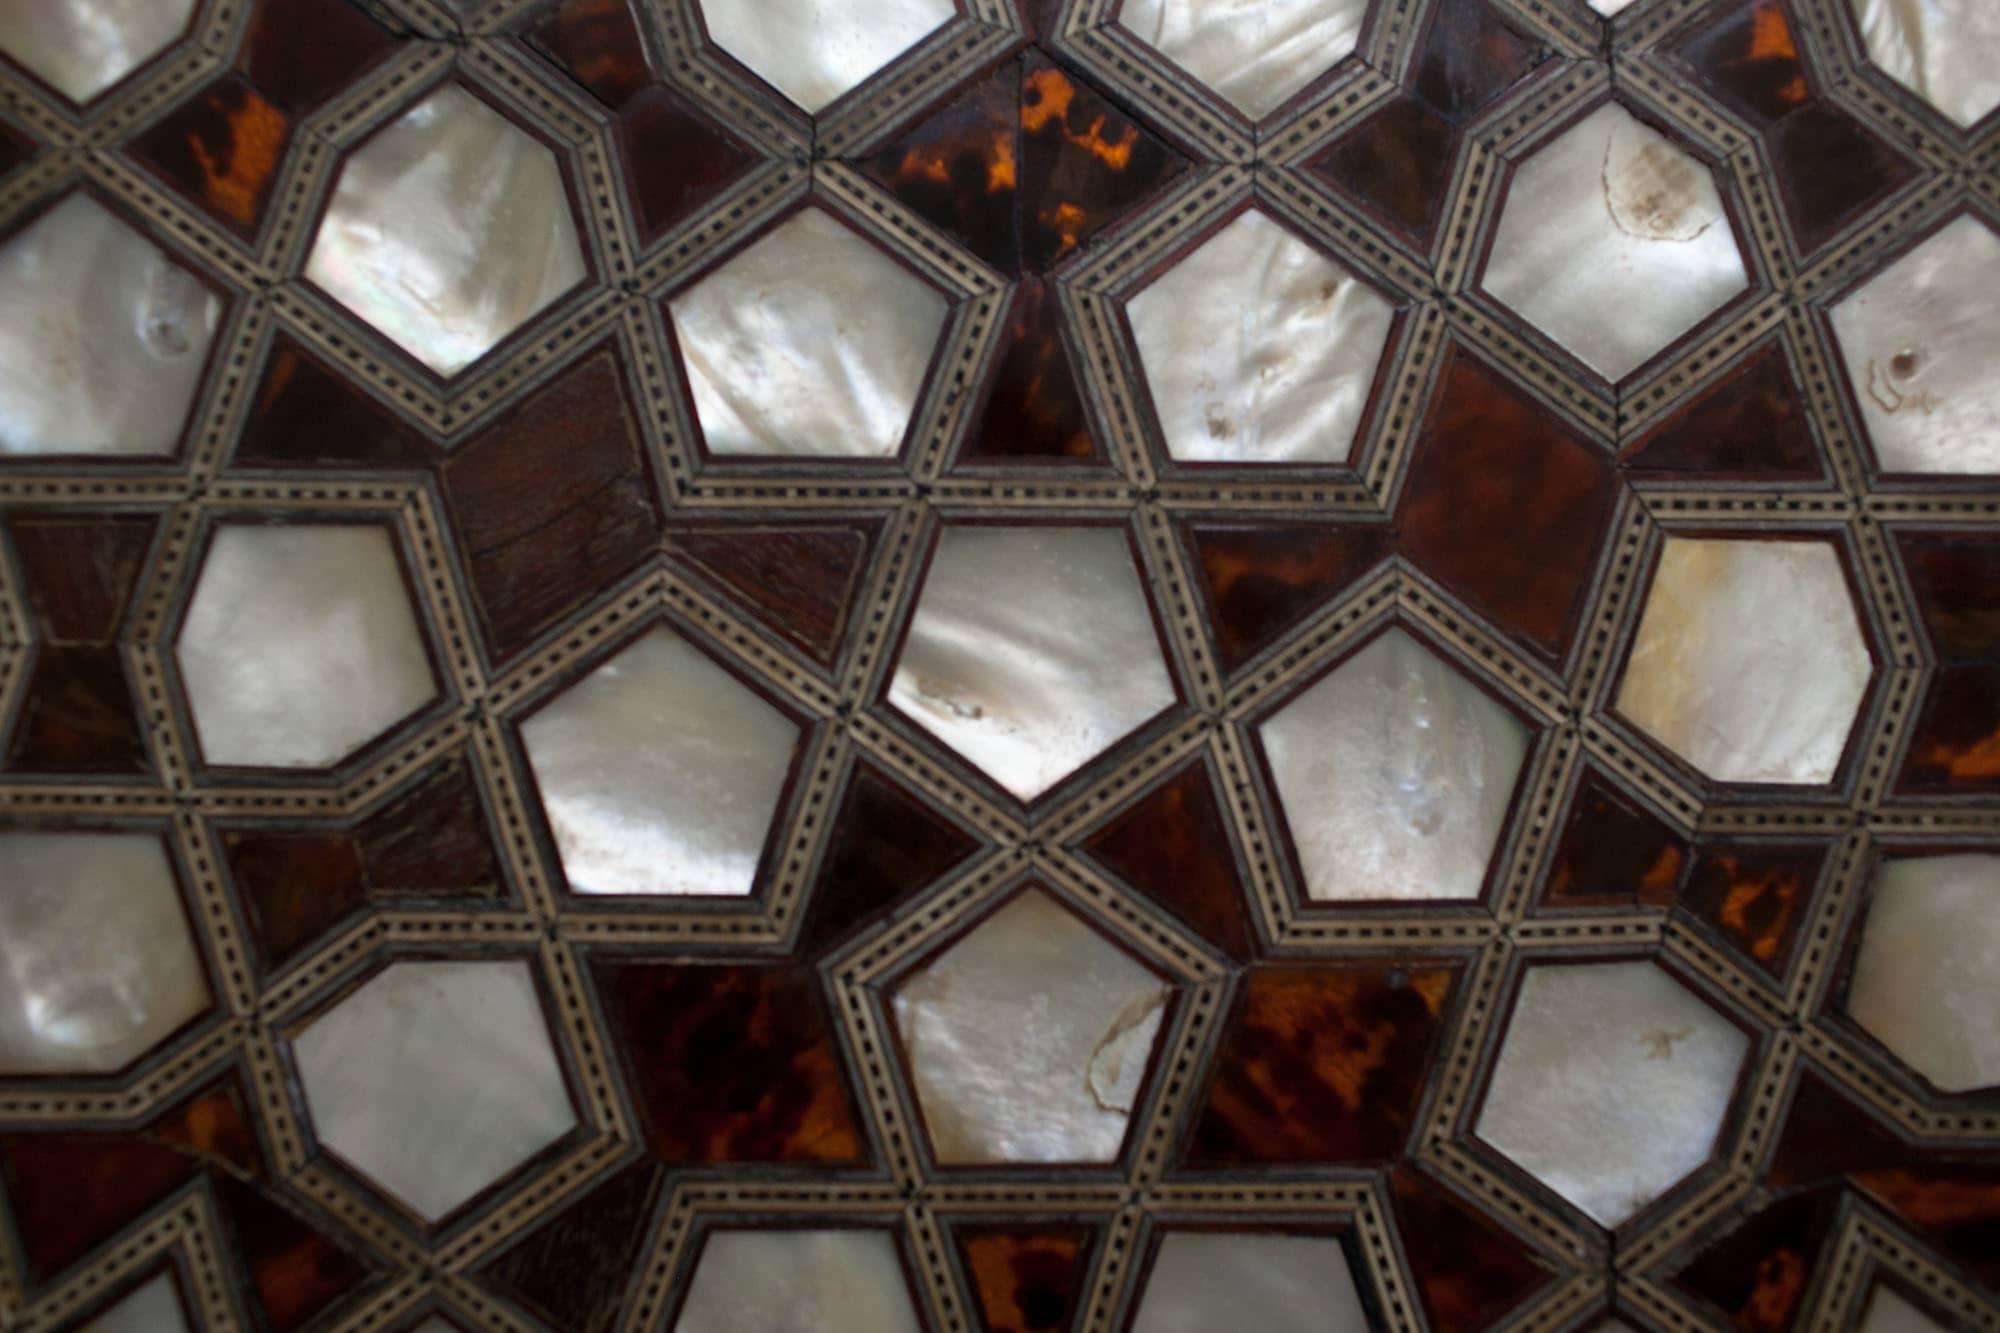 Mosaics and tile work in Topkapi Sarayi in Istanbul, Turkey.